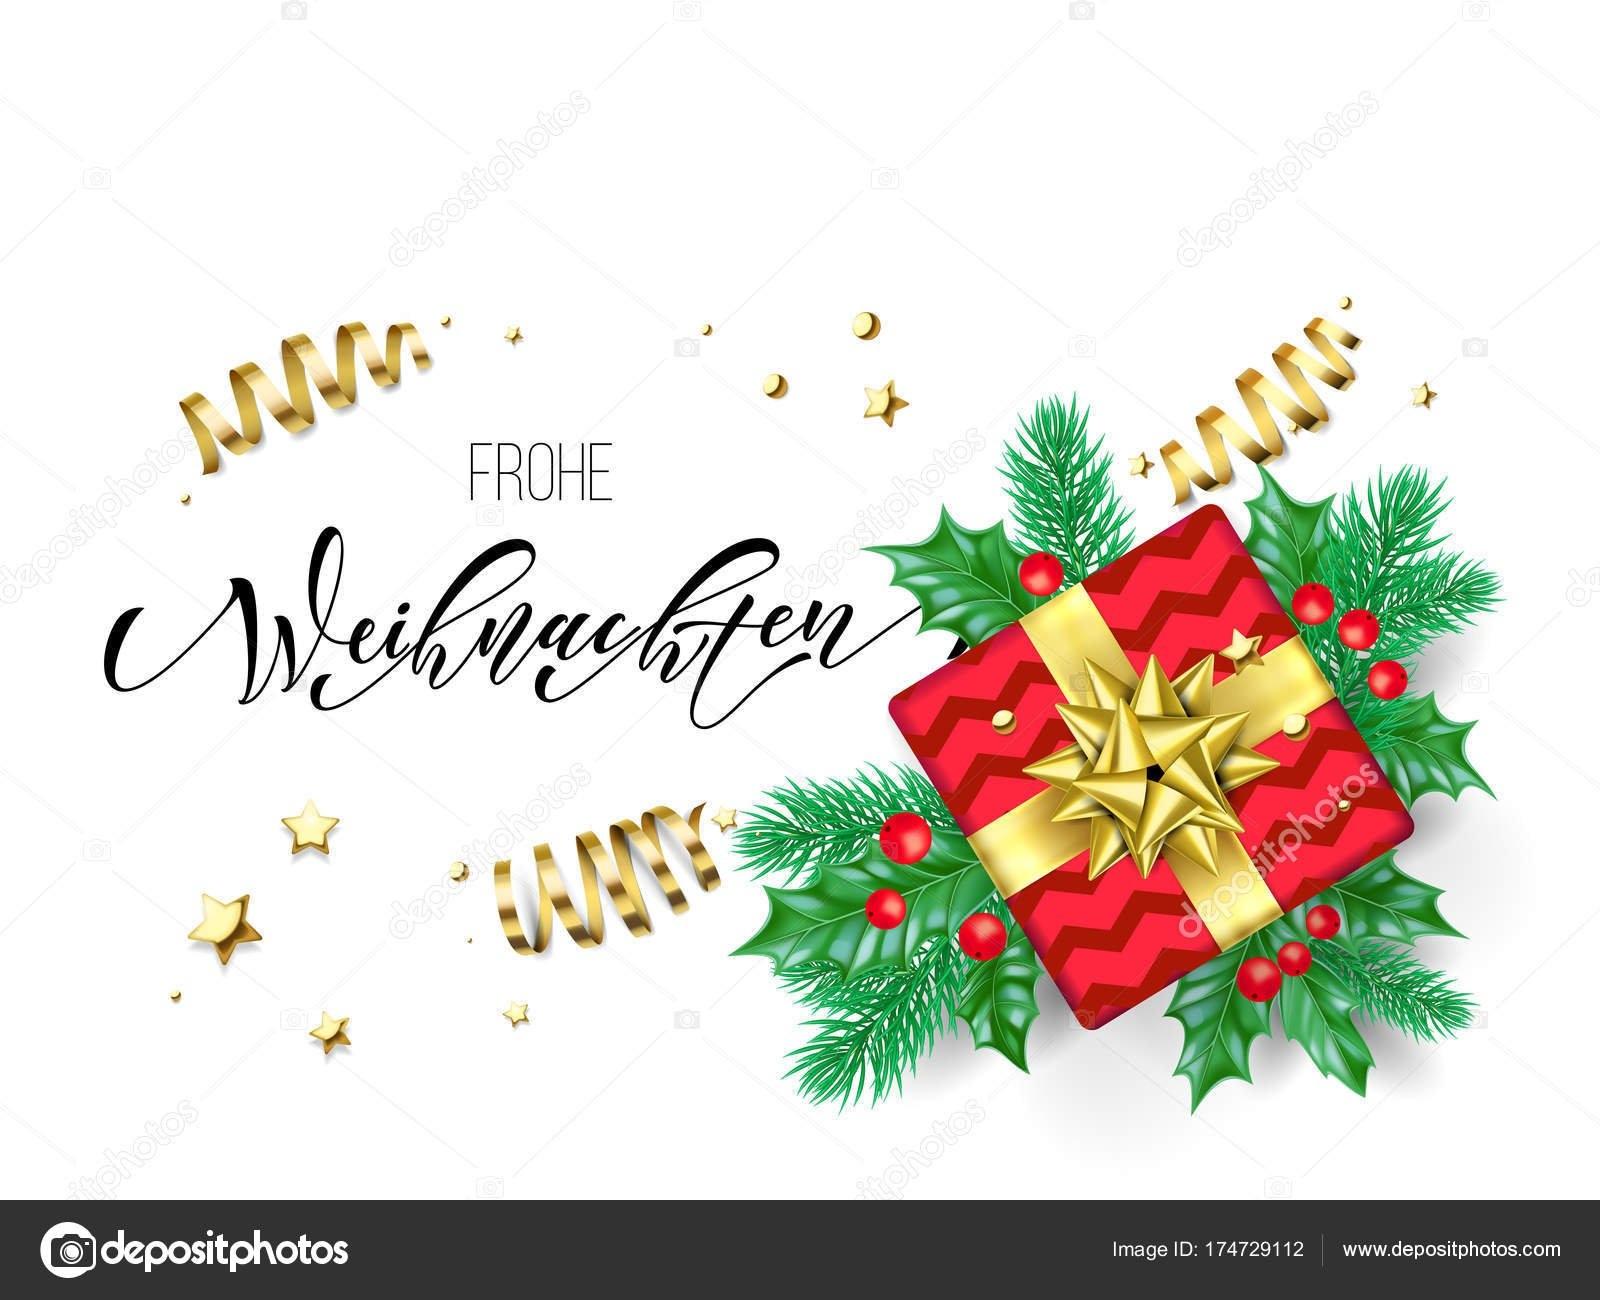 Free Printable German Christmas Cards – Festival Collections - Free Printable German Christmas Cards